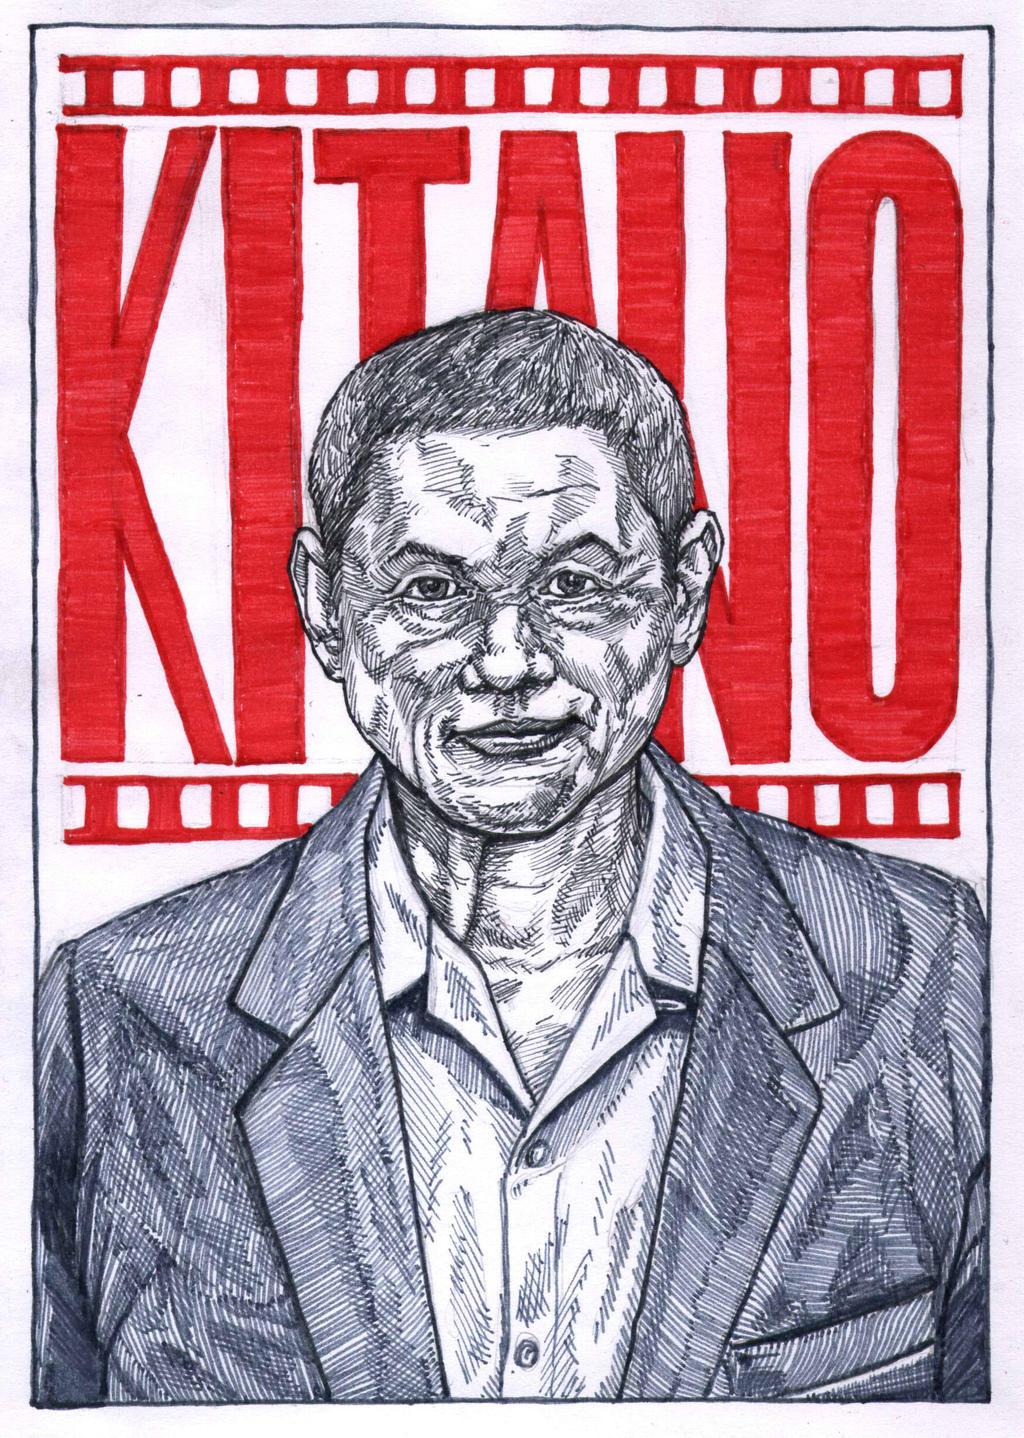 Takeshi Kitano by WolfMagnum